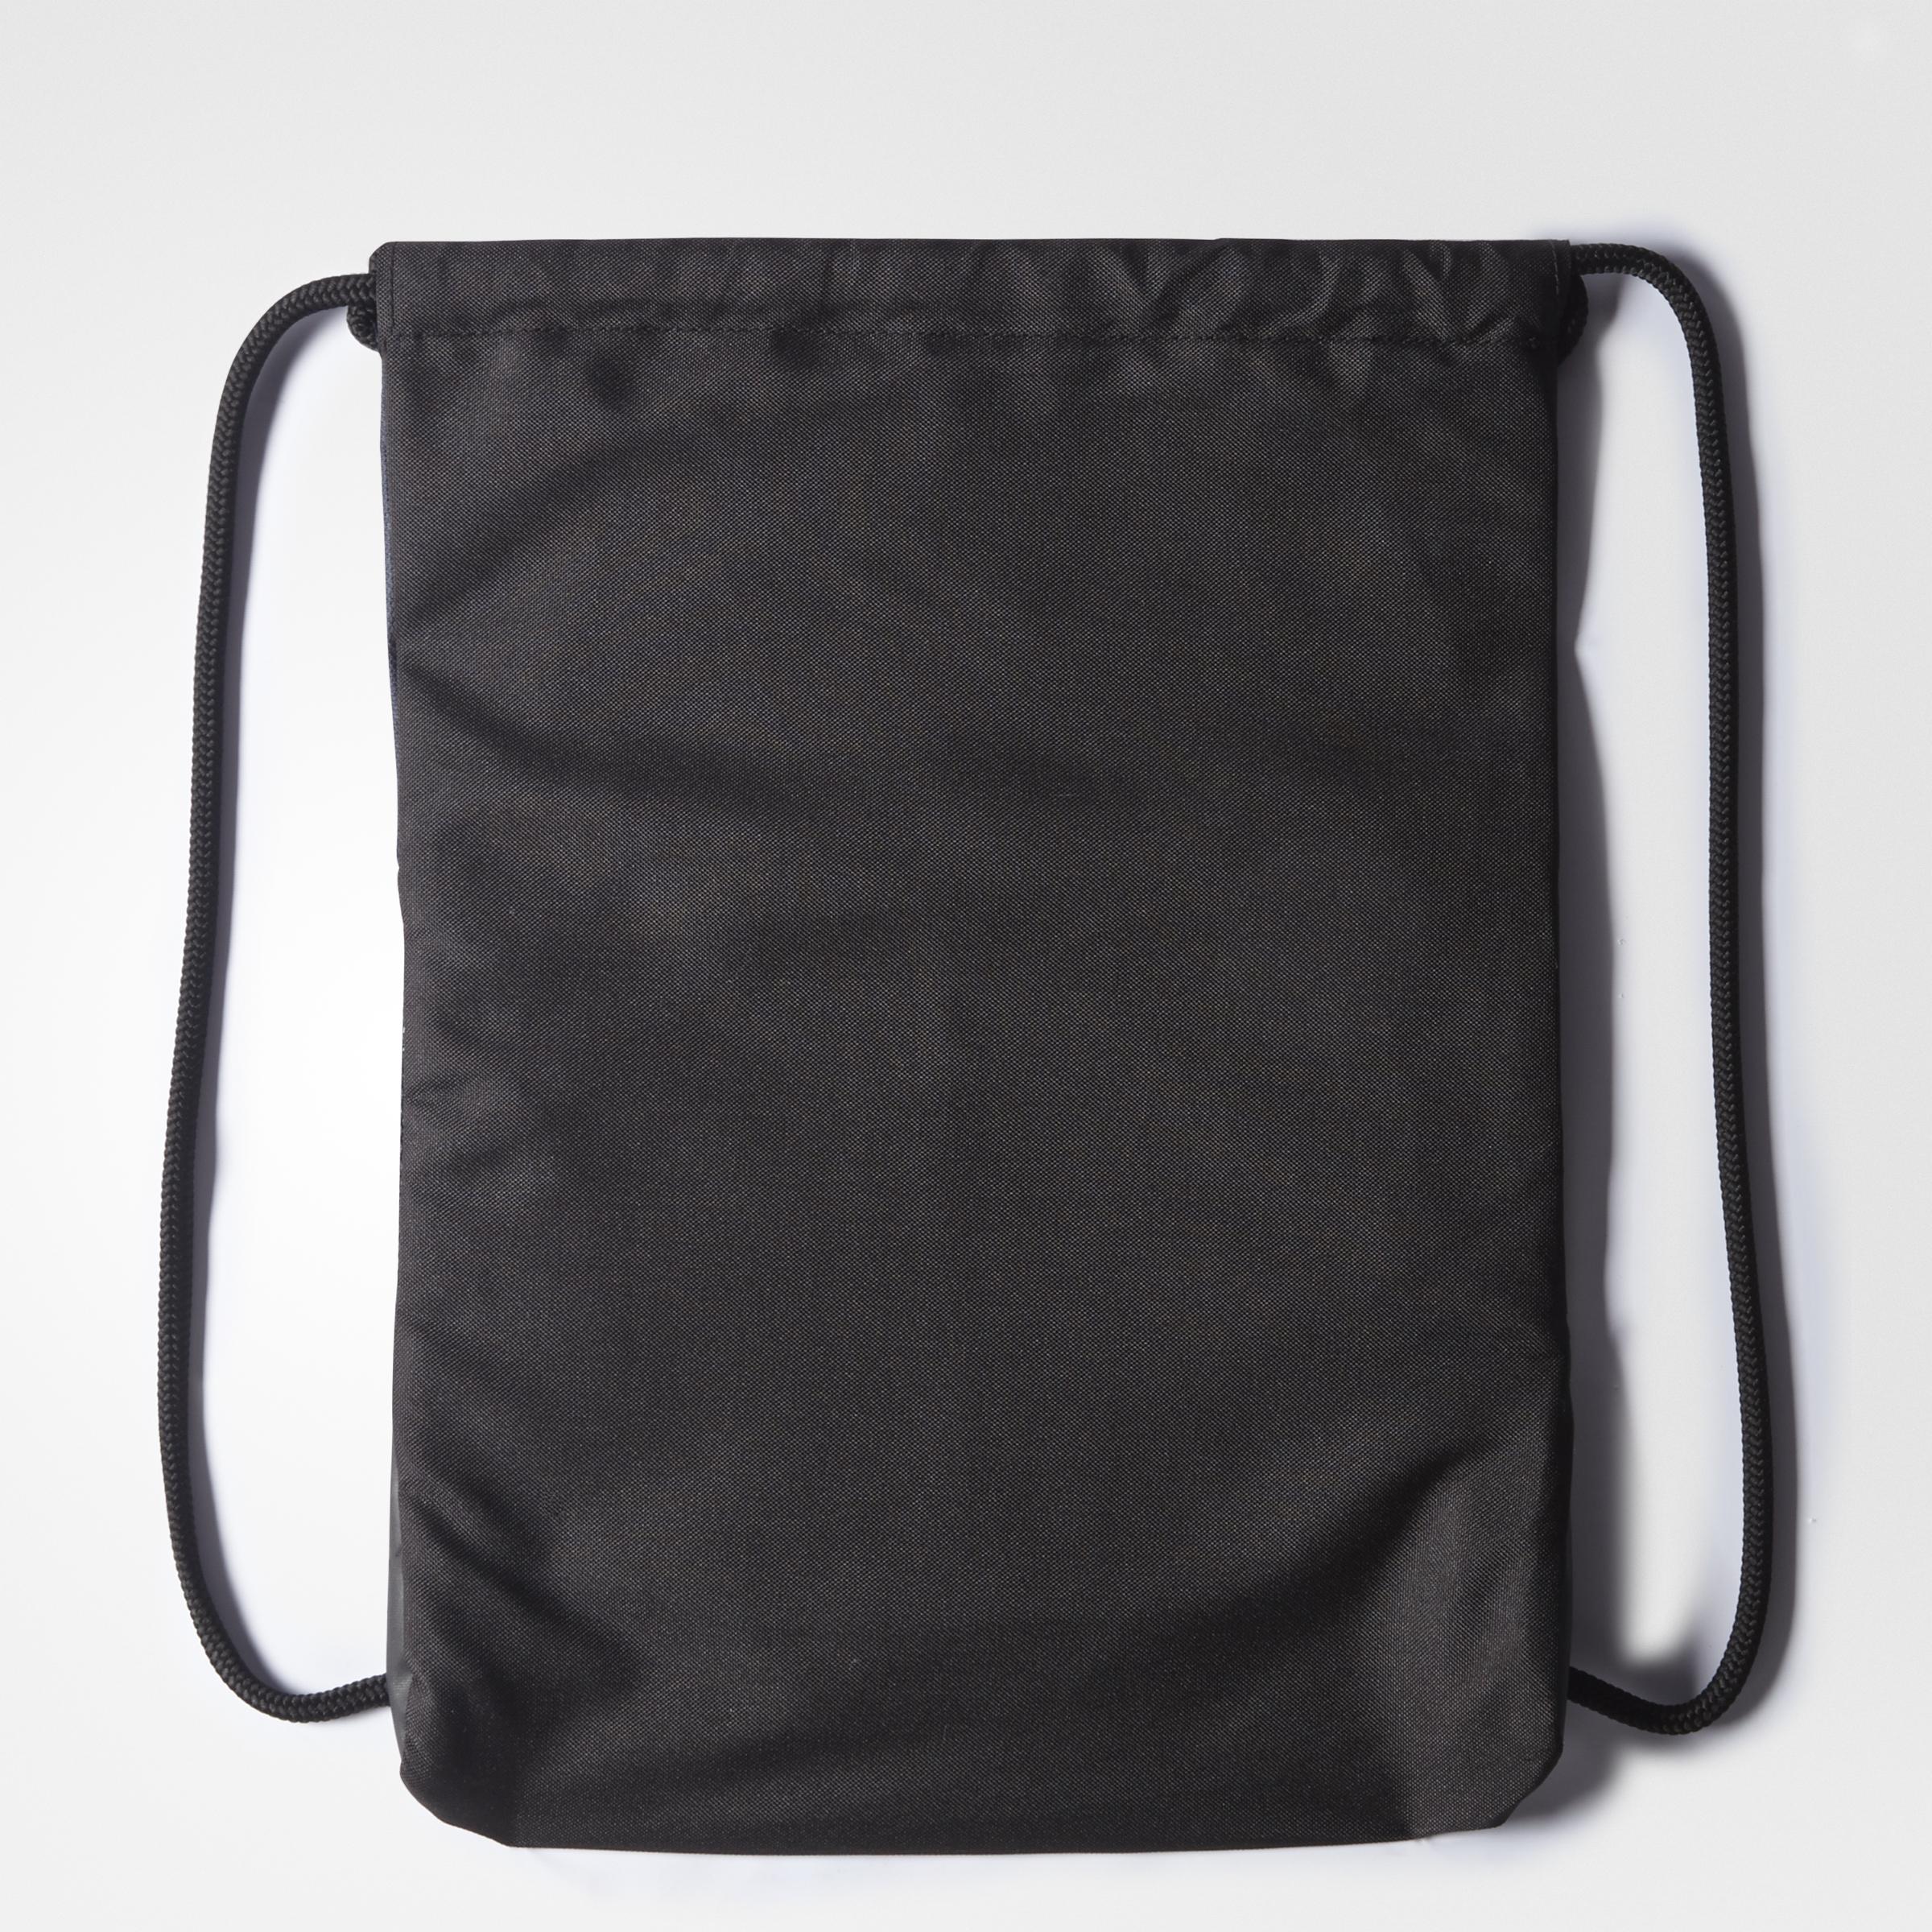 adidas-Lightning-Sackpack-Bags miniature 12